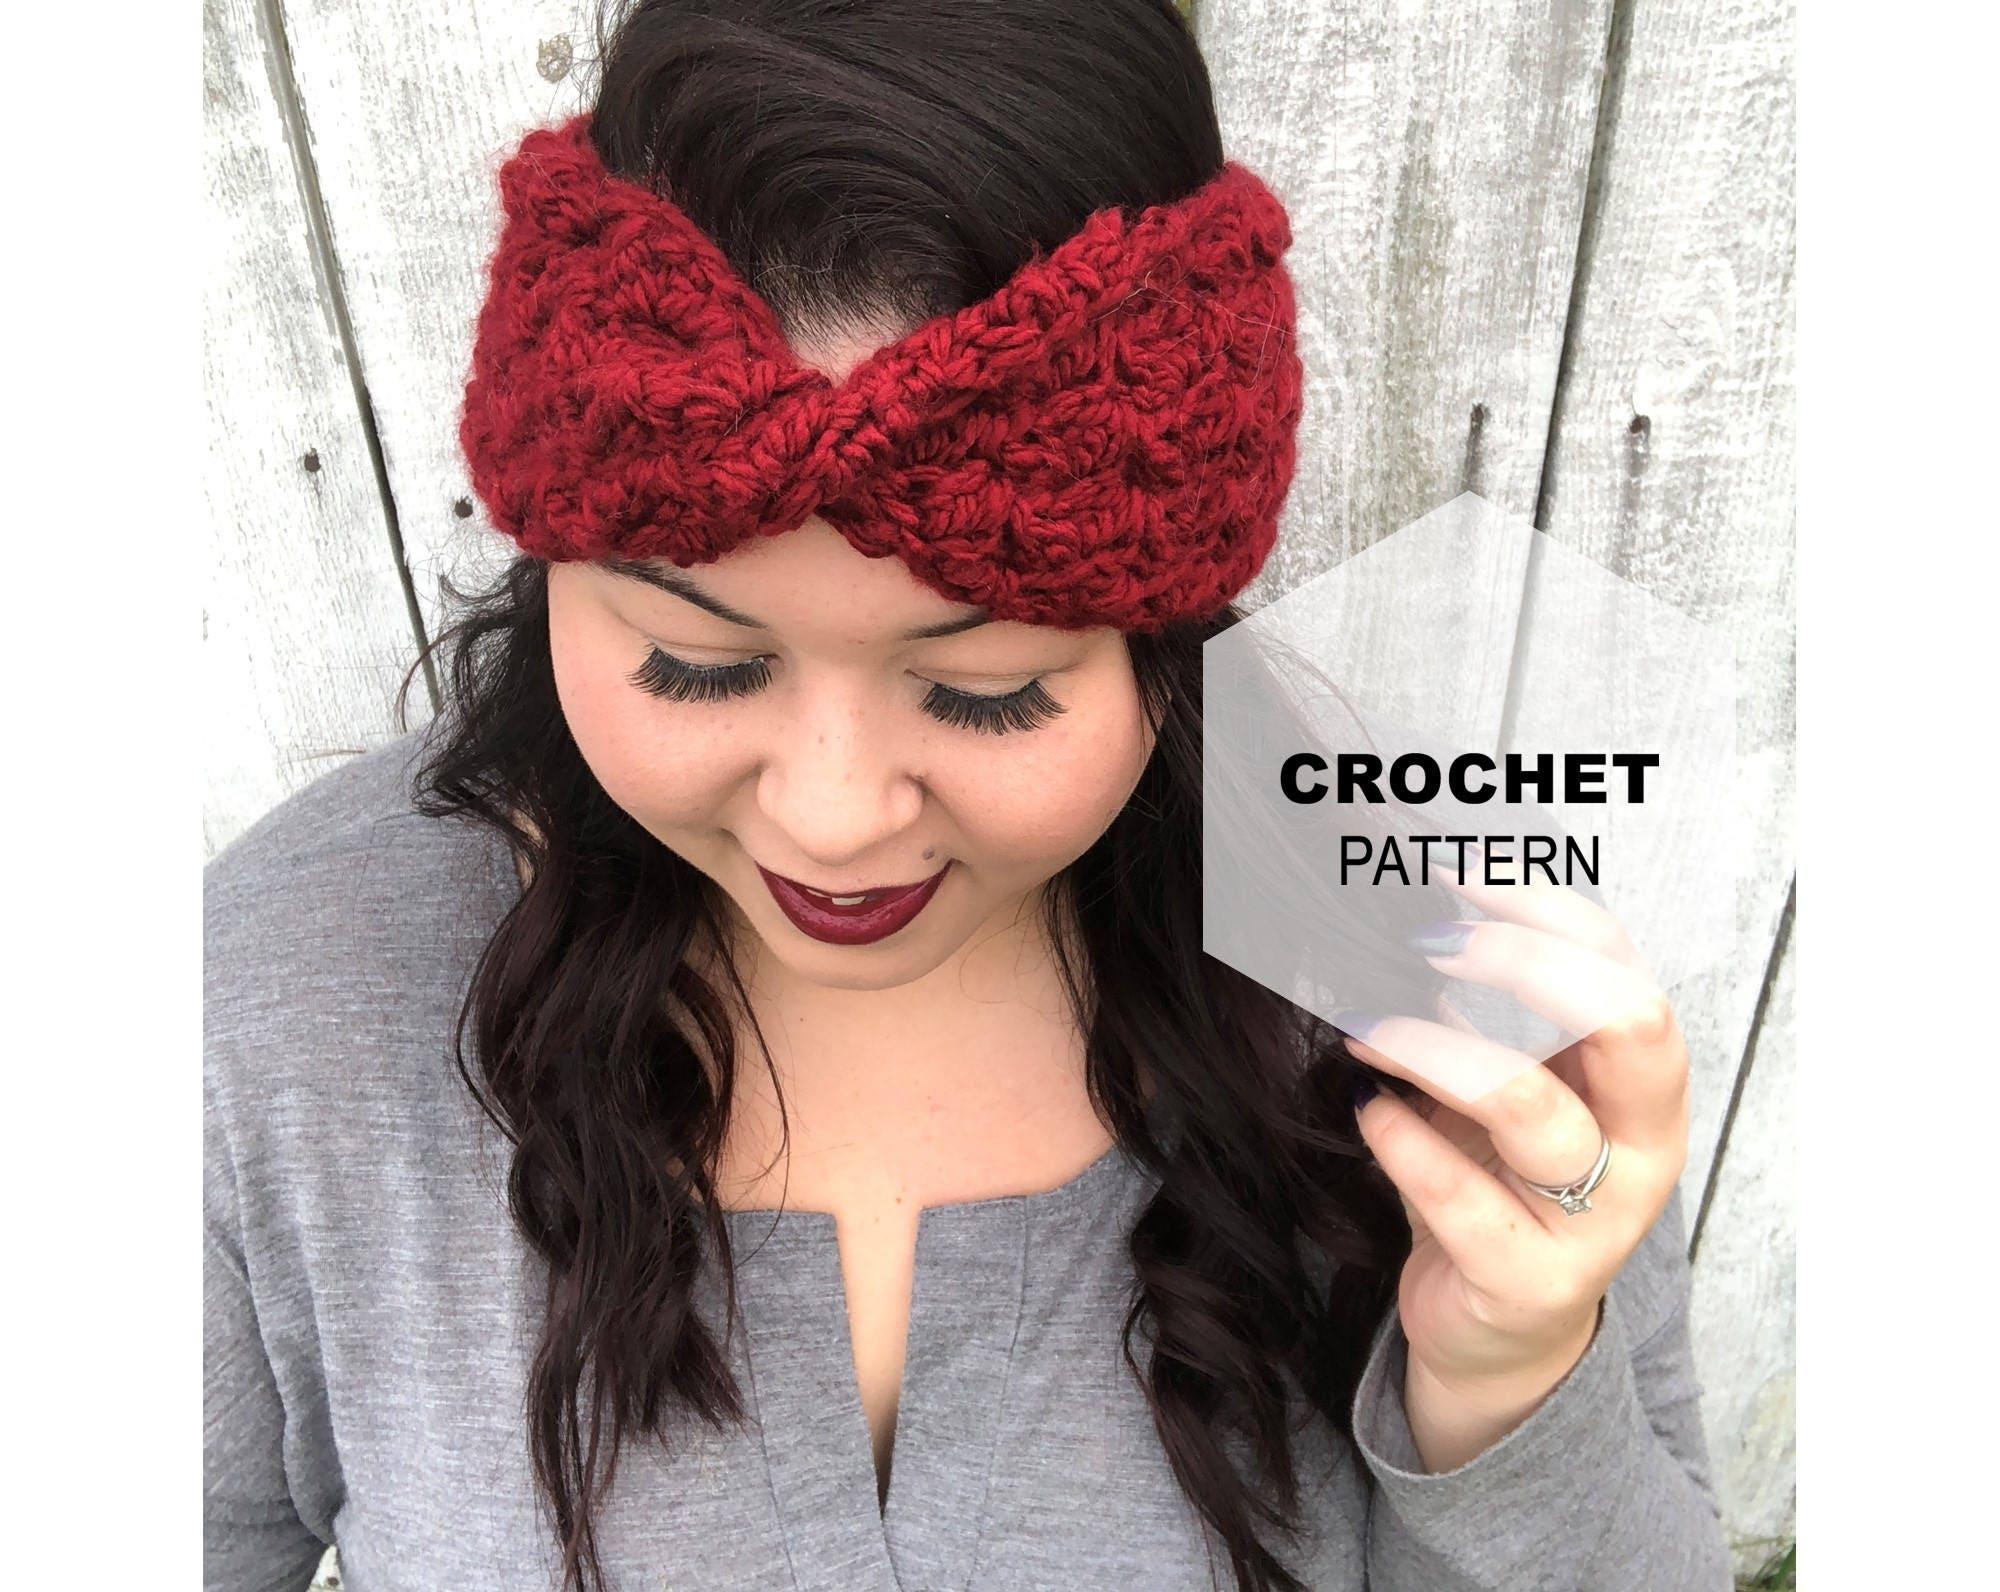 Crochet Headband Pattern Crochet Pattern Twisted Headband Etsy